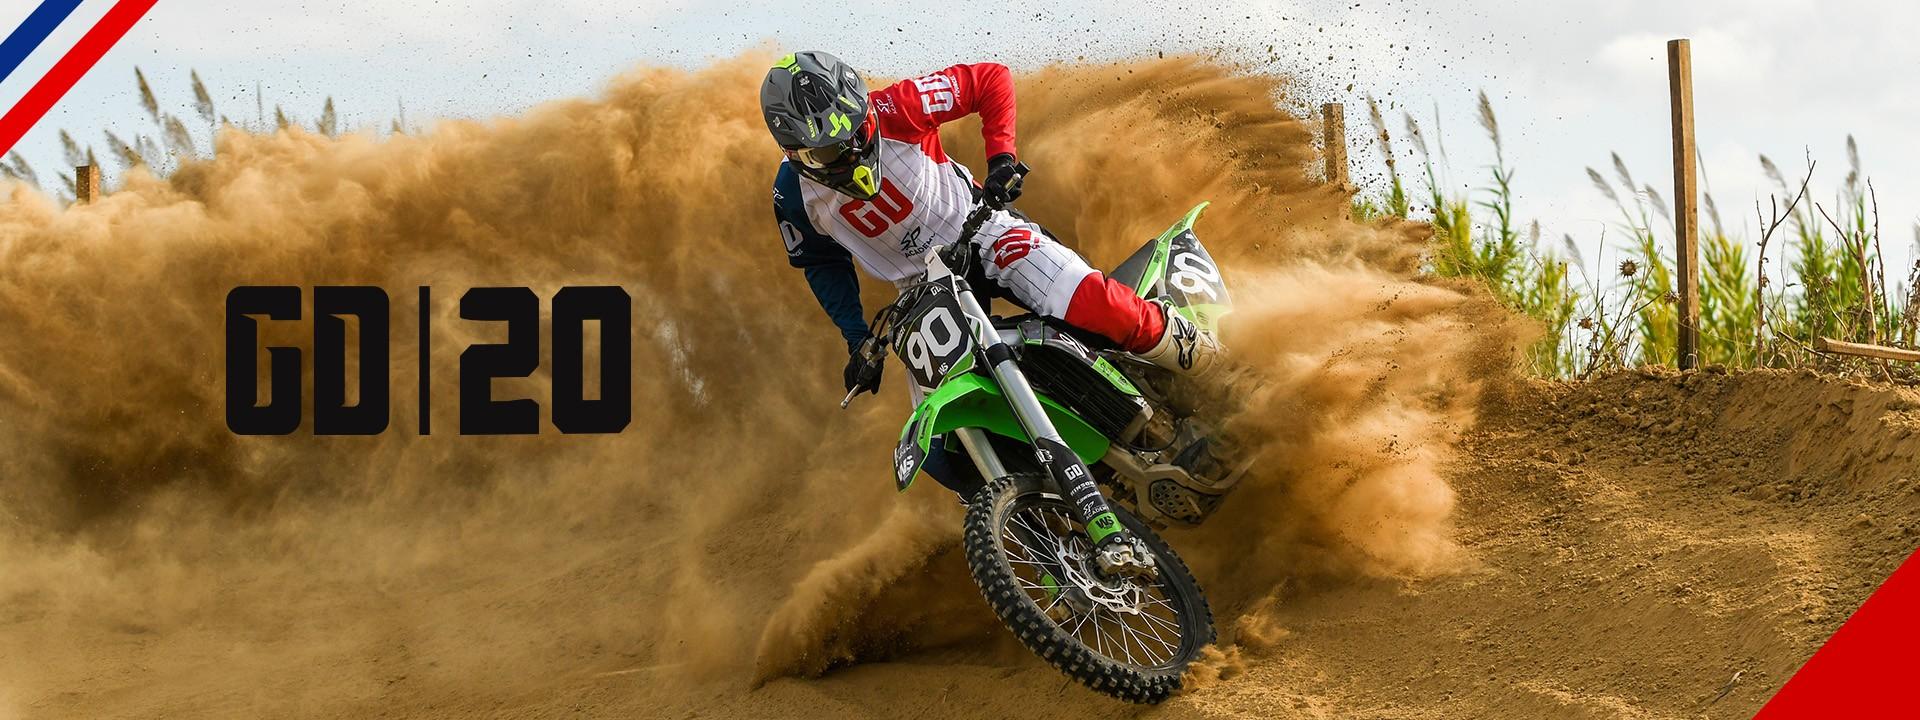 Tenue GD20 motocross - enduro - quad : pantalon - maillot - gants